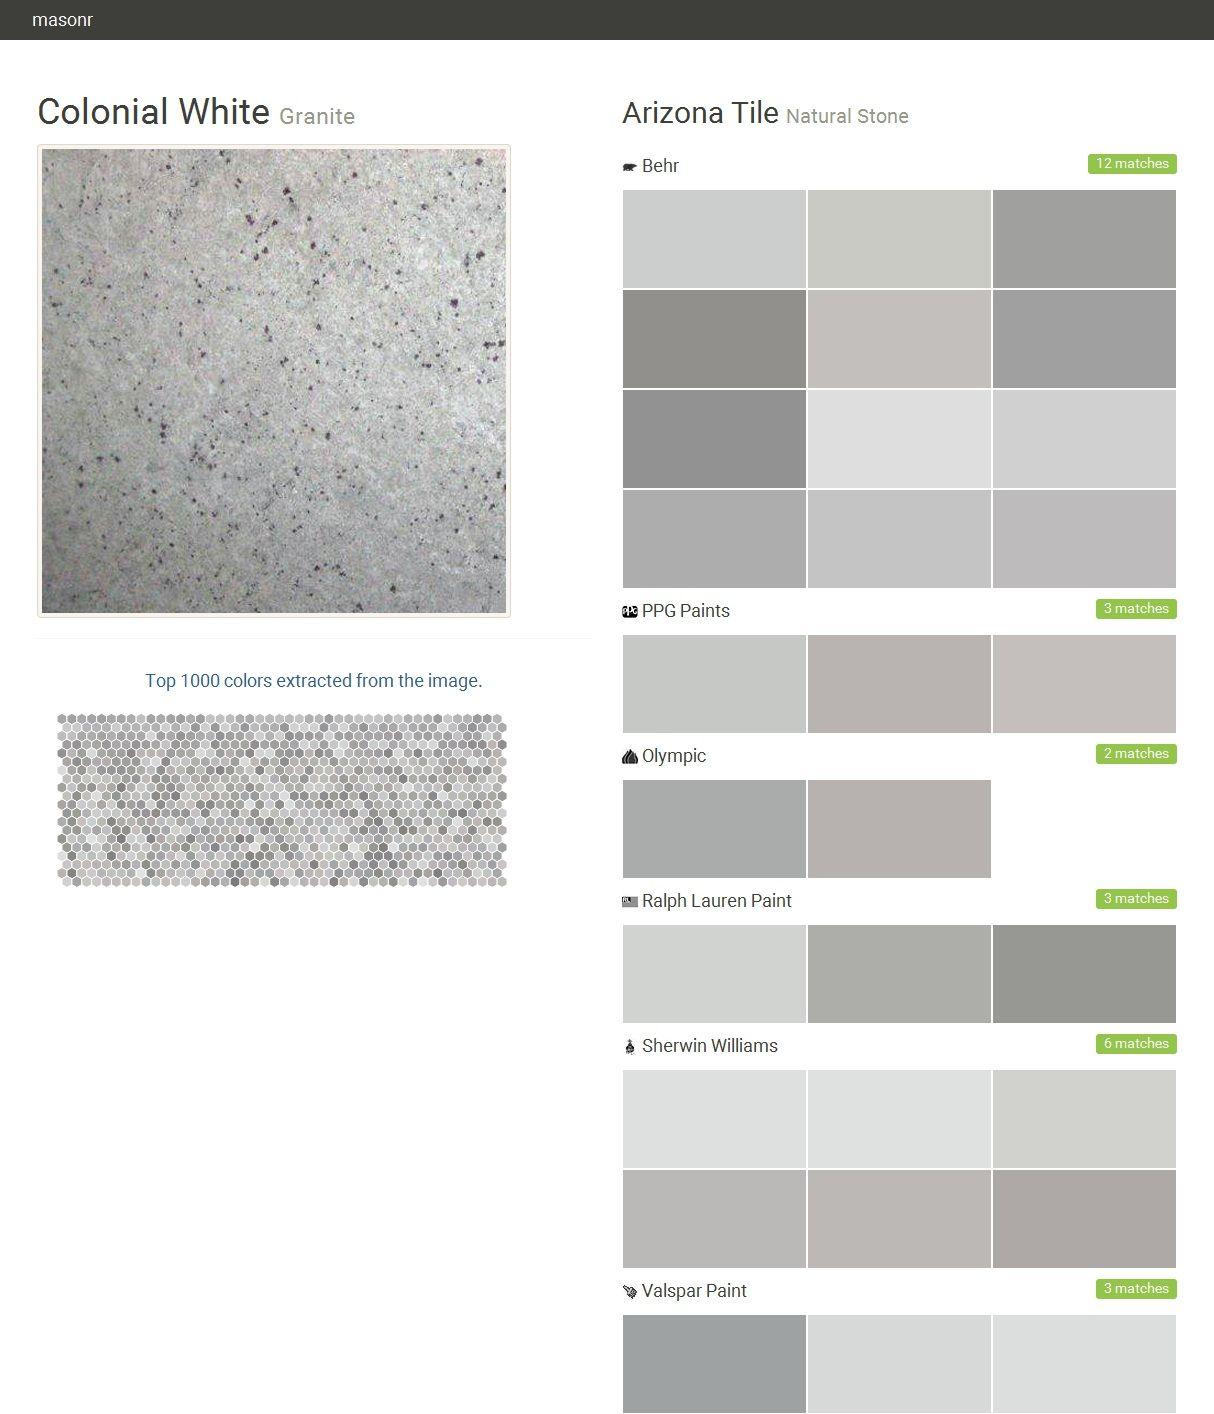 Colonial White Granite Natural Stone Arizona Tile Behr Ppg Paints Olympic Ralph Lauren Paint Sherwin Williams Valspar